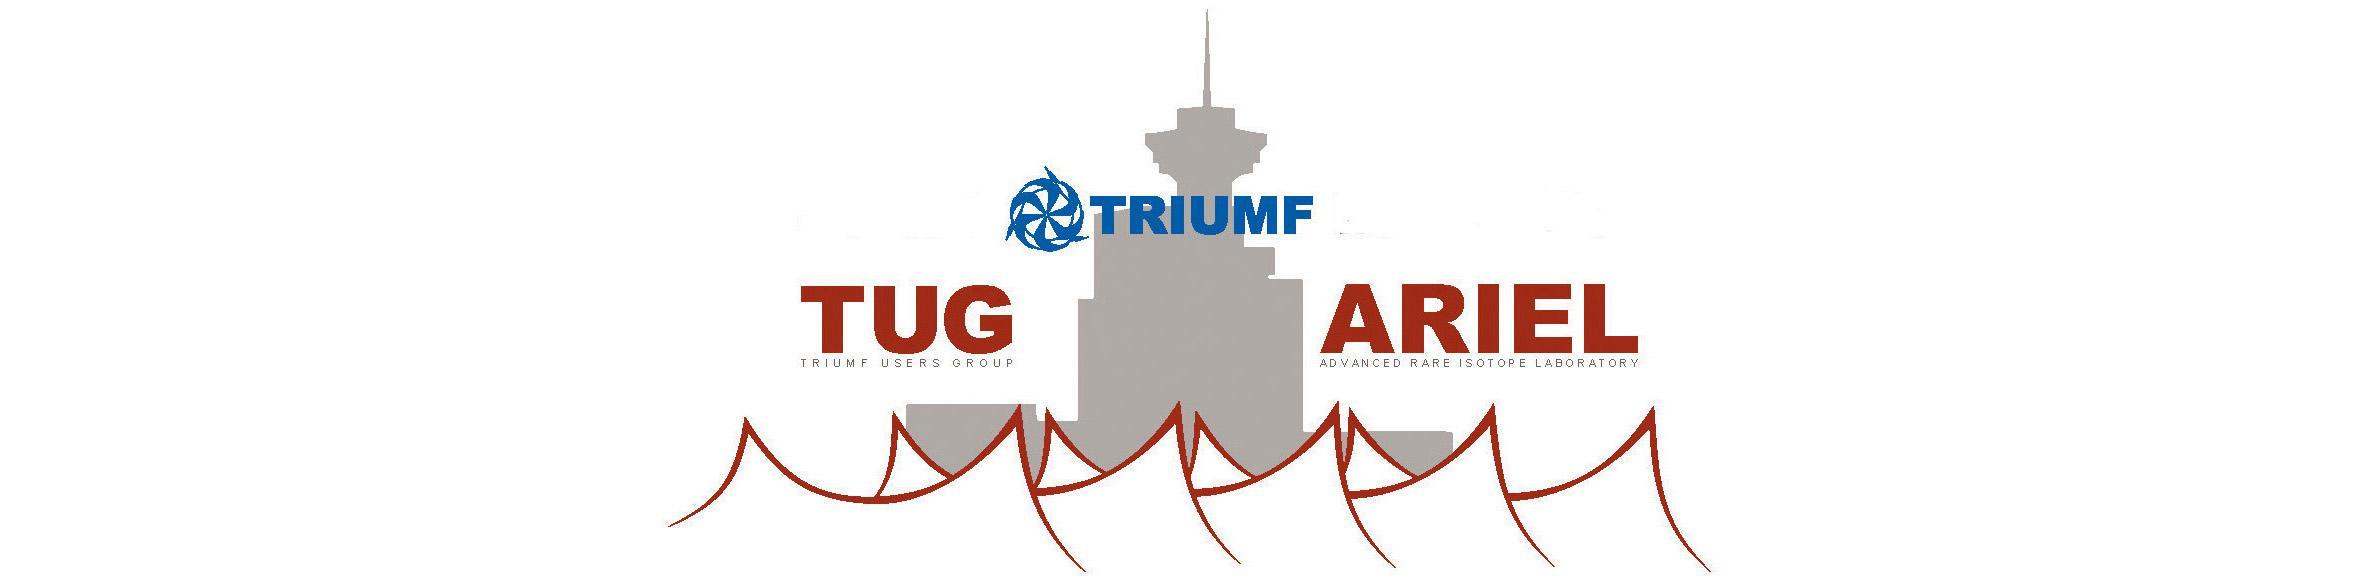 TUGASW2011